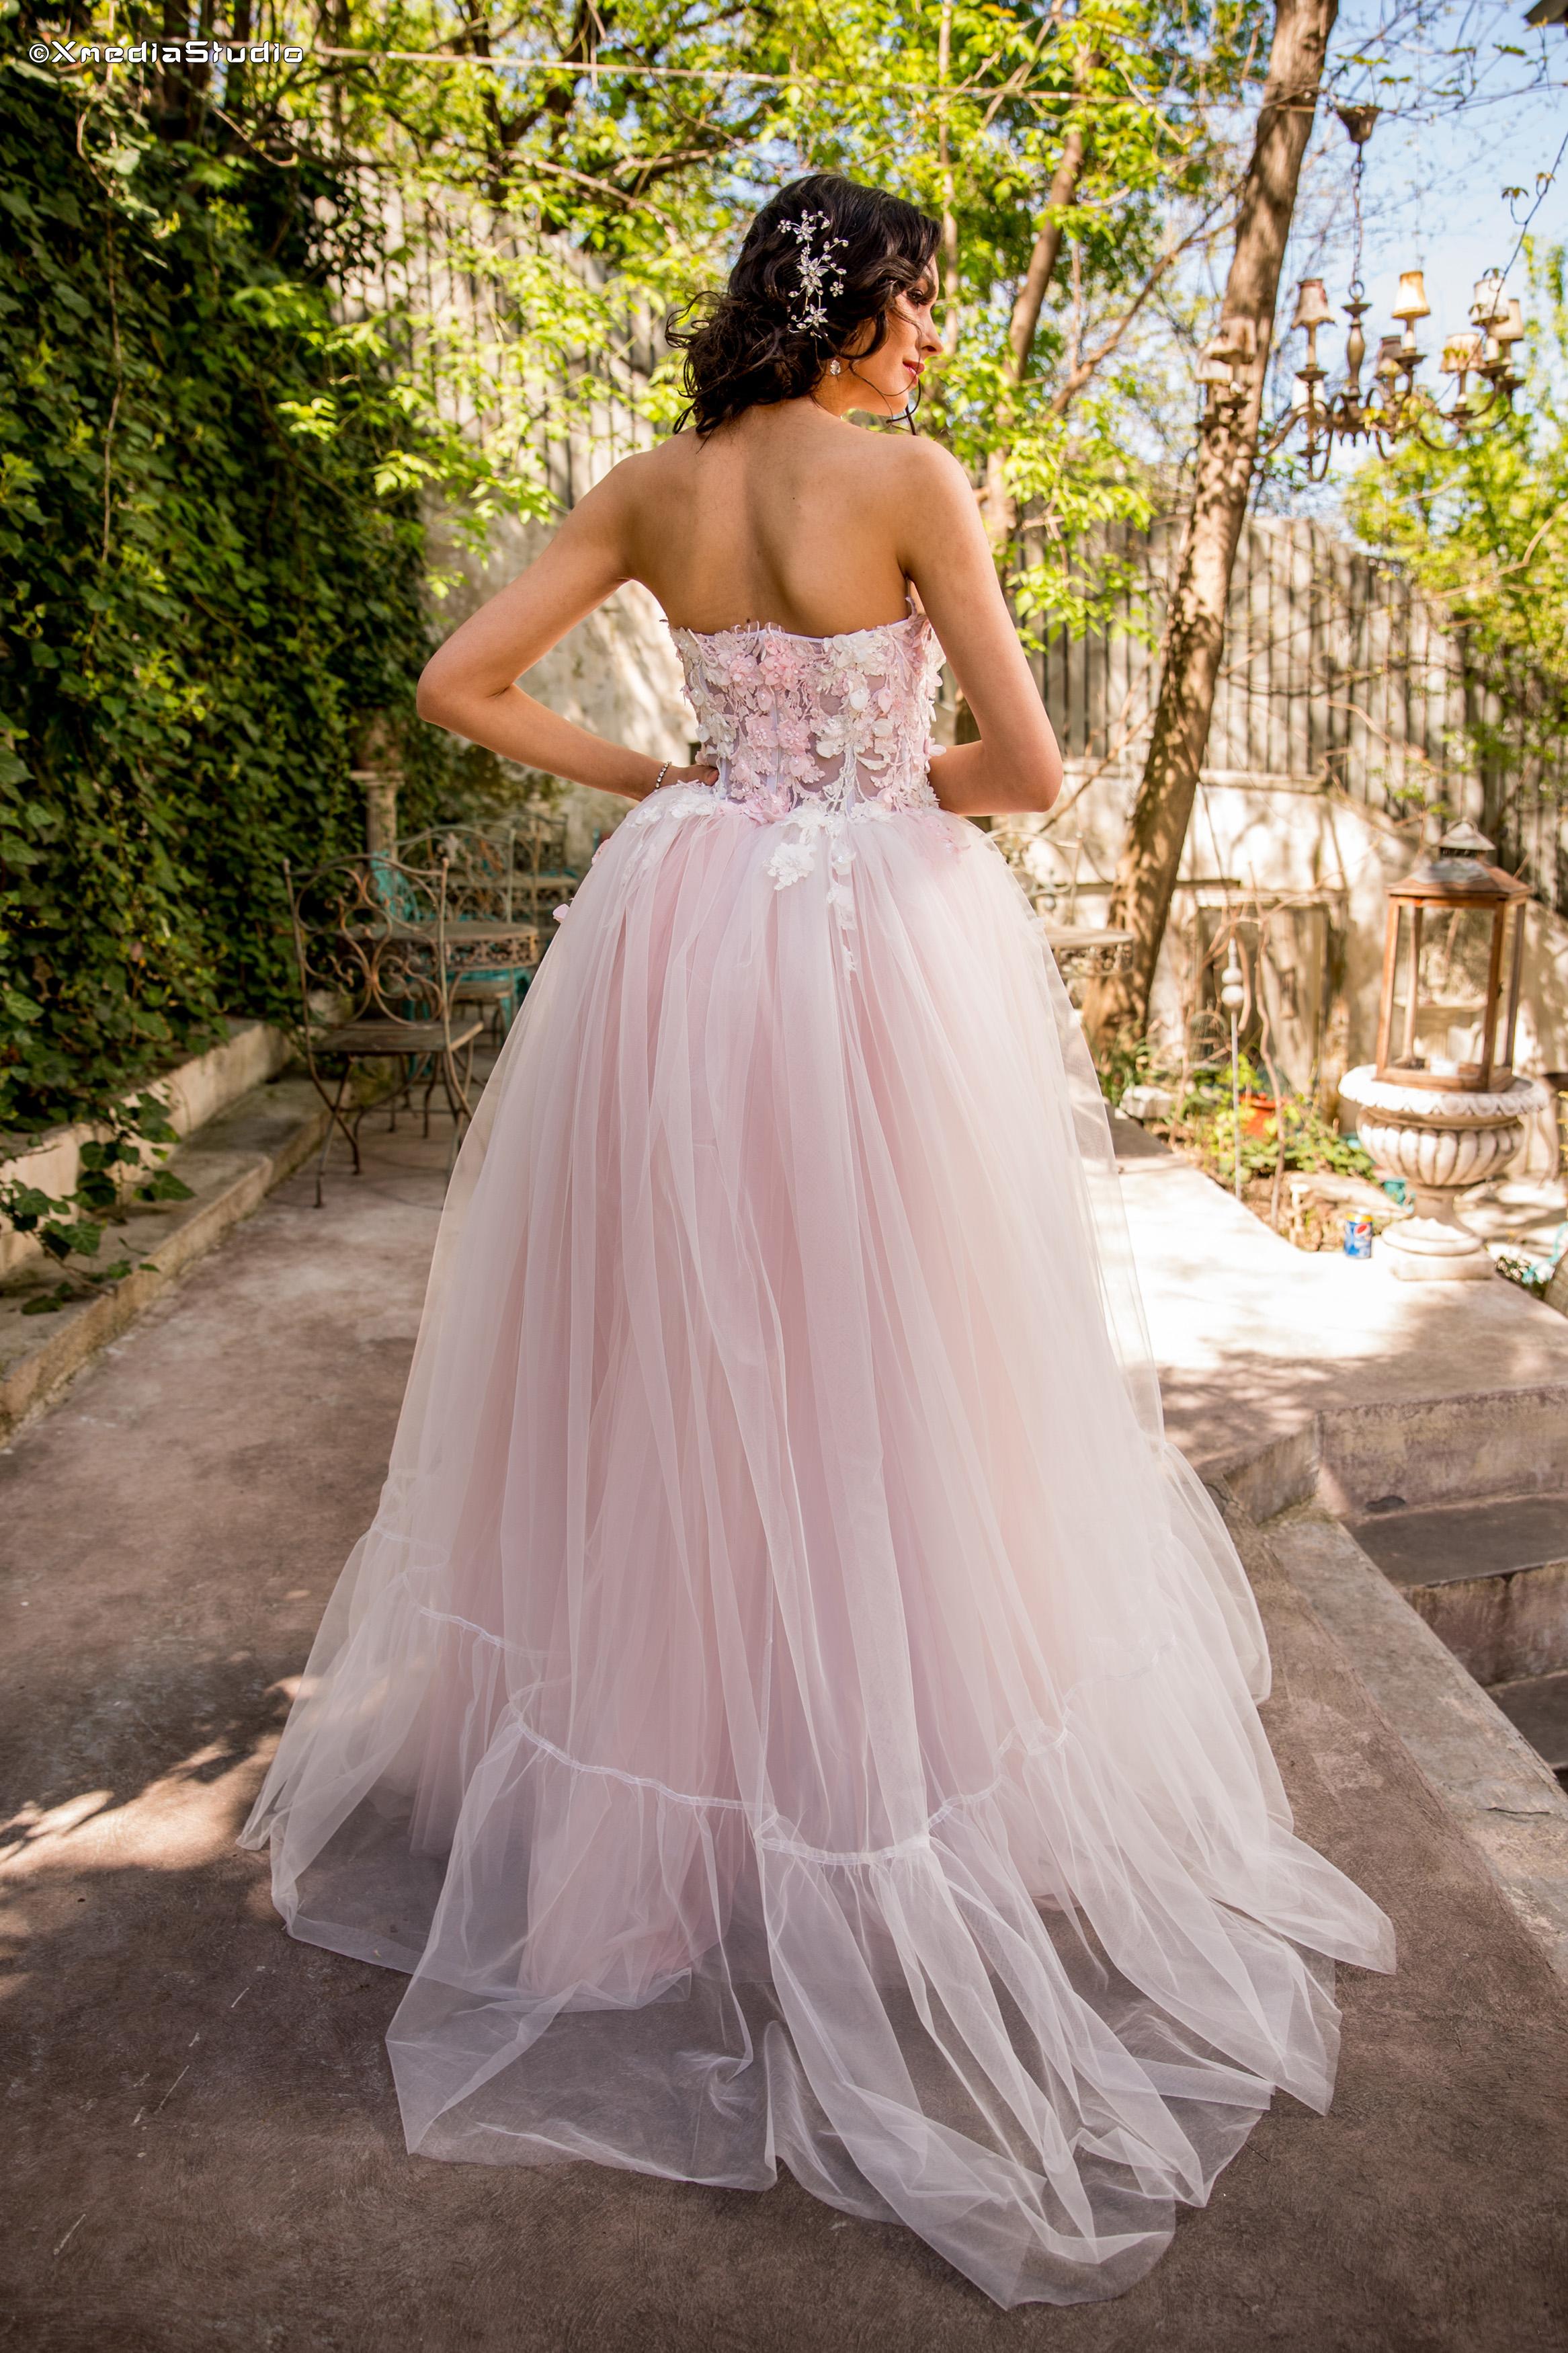 2018 wedding dresses fashion by laina (81).jpg